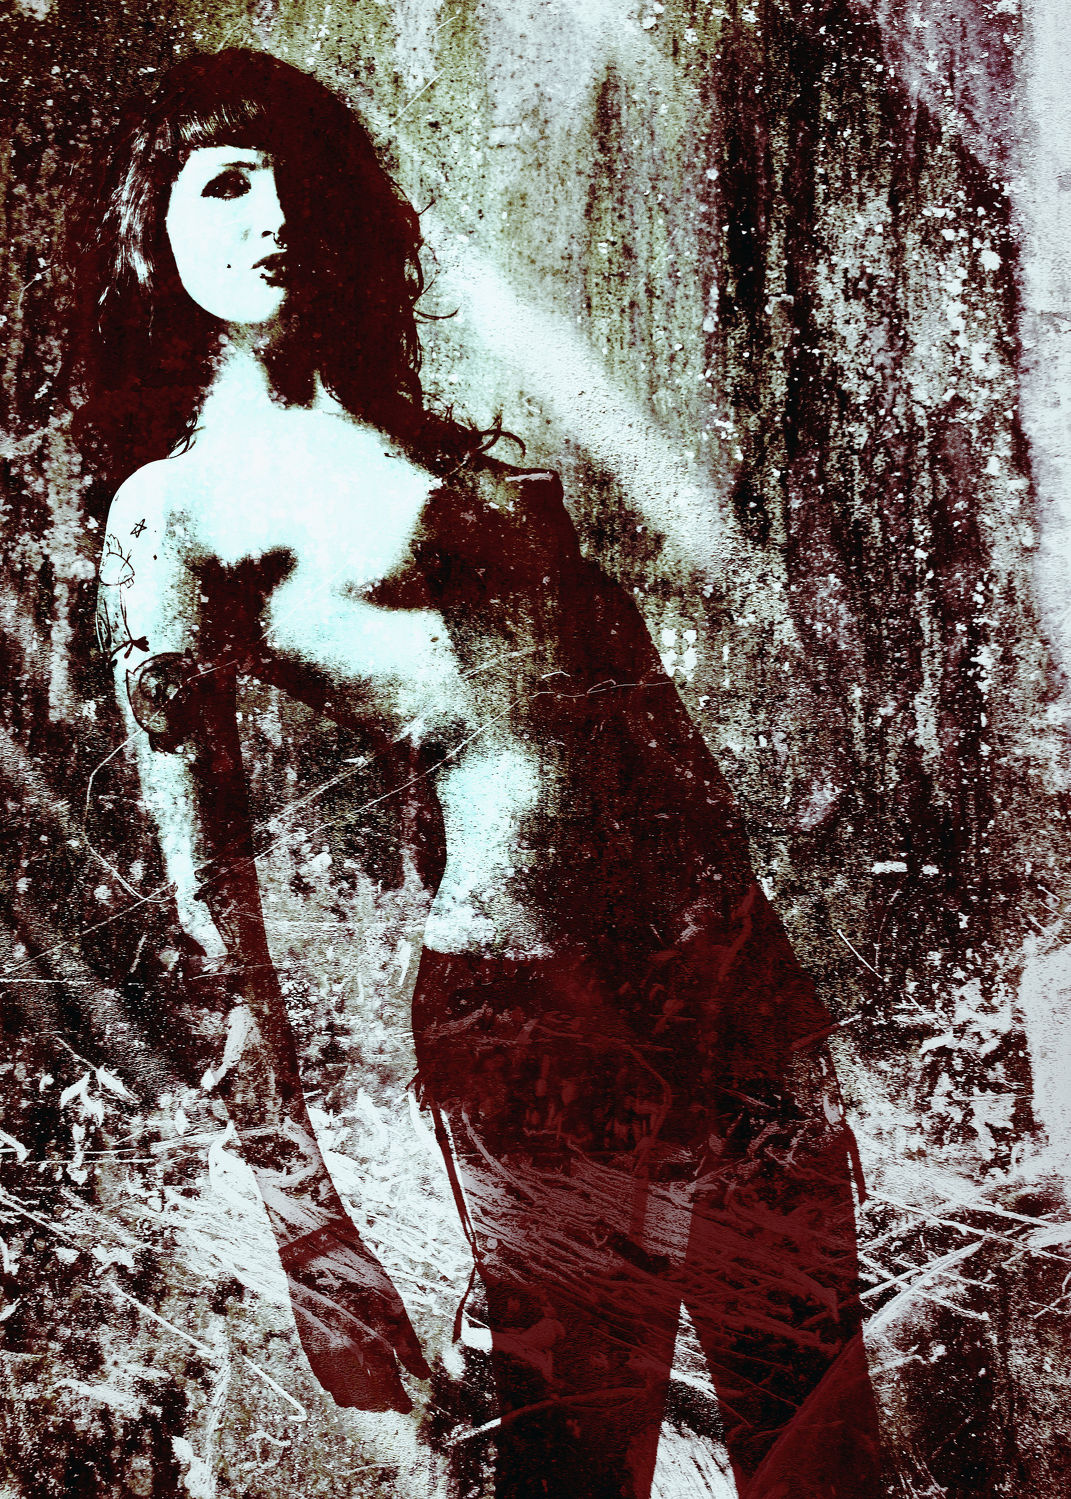 Bild mit nude, Dessous, Fotokunst Art FF77, Fetisch, Erotik, Portrait, Studio, Frau, Aktmodel, Aktfoto, Aktfotografie, erotisch, Frauen, nackt, Sexy, Brust, Erotic, Akt & Erotik, girl